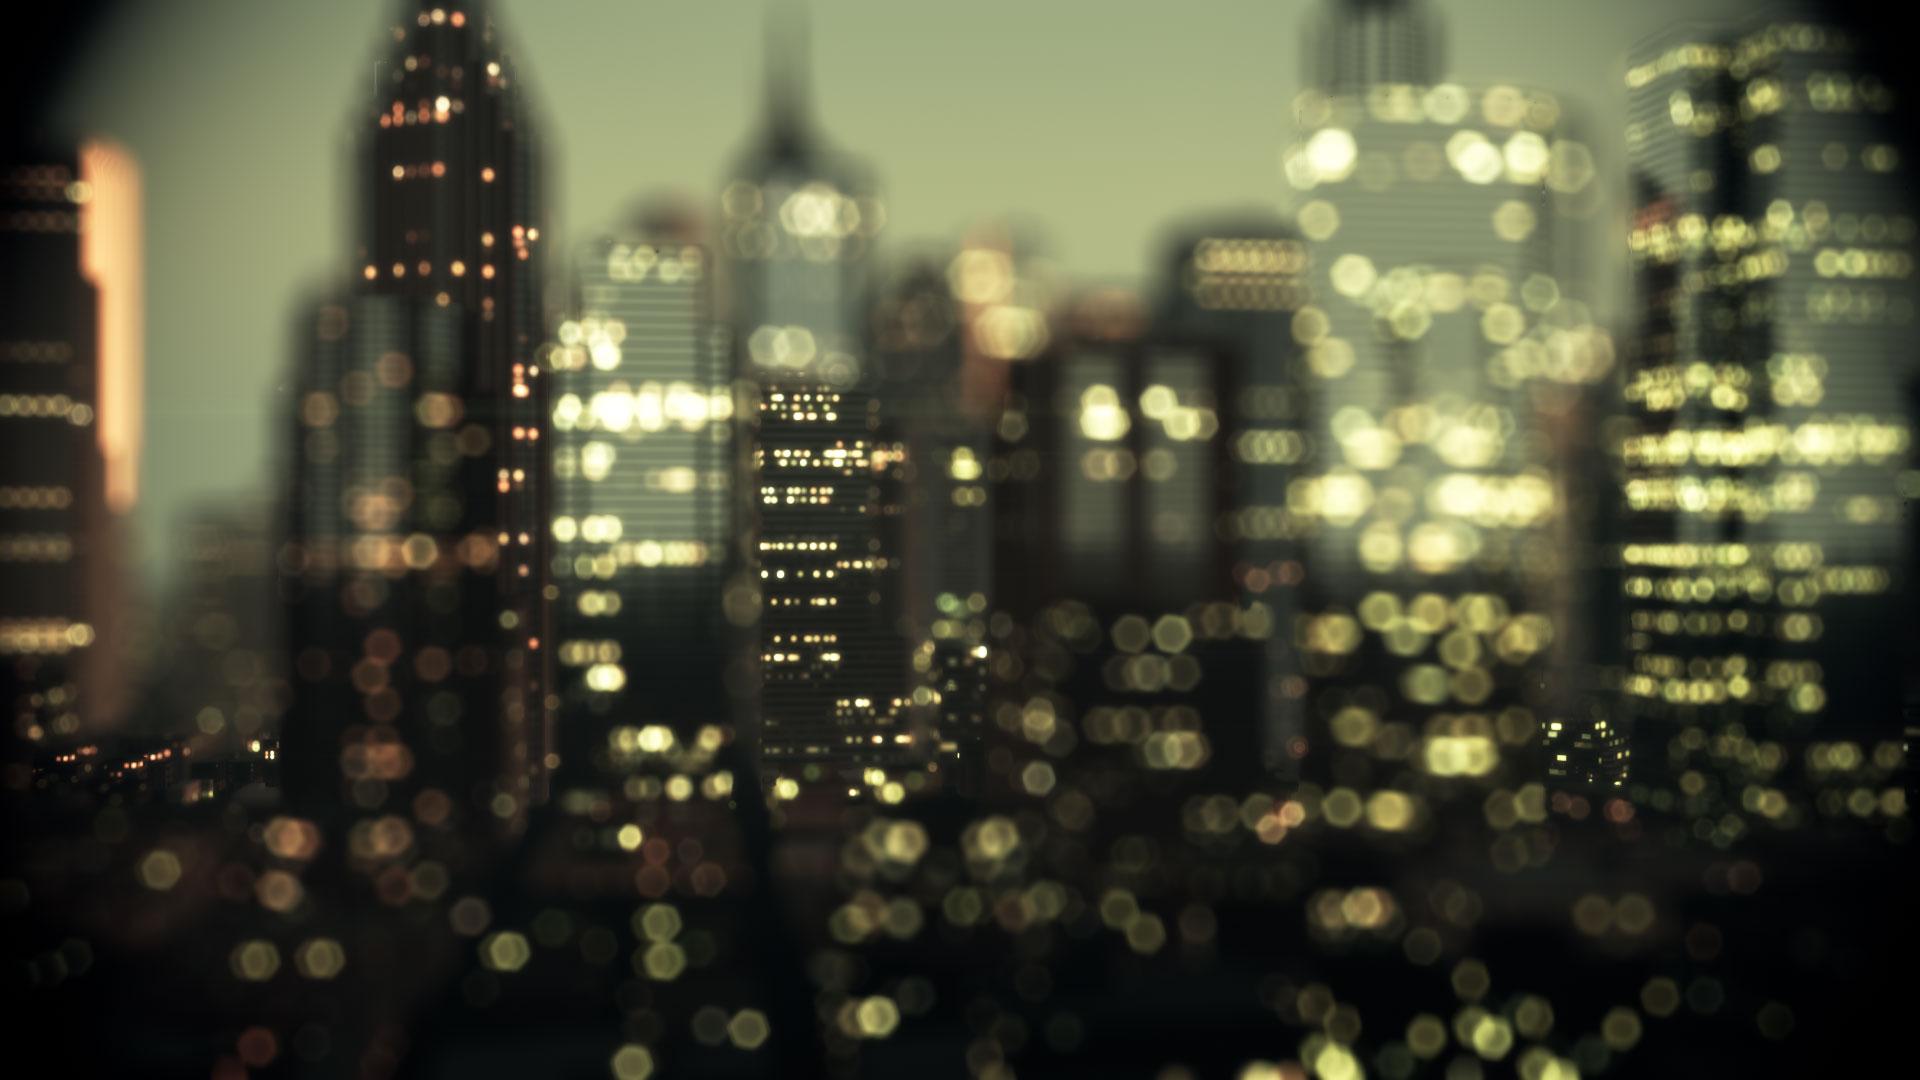 pin city nightlife wallpaper - photo #49